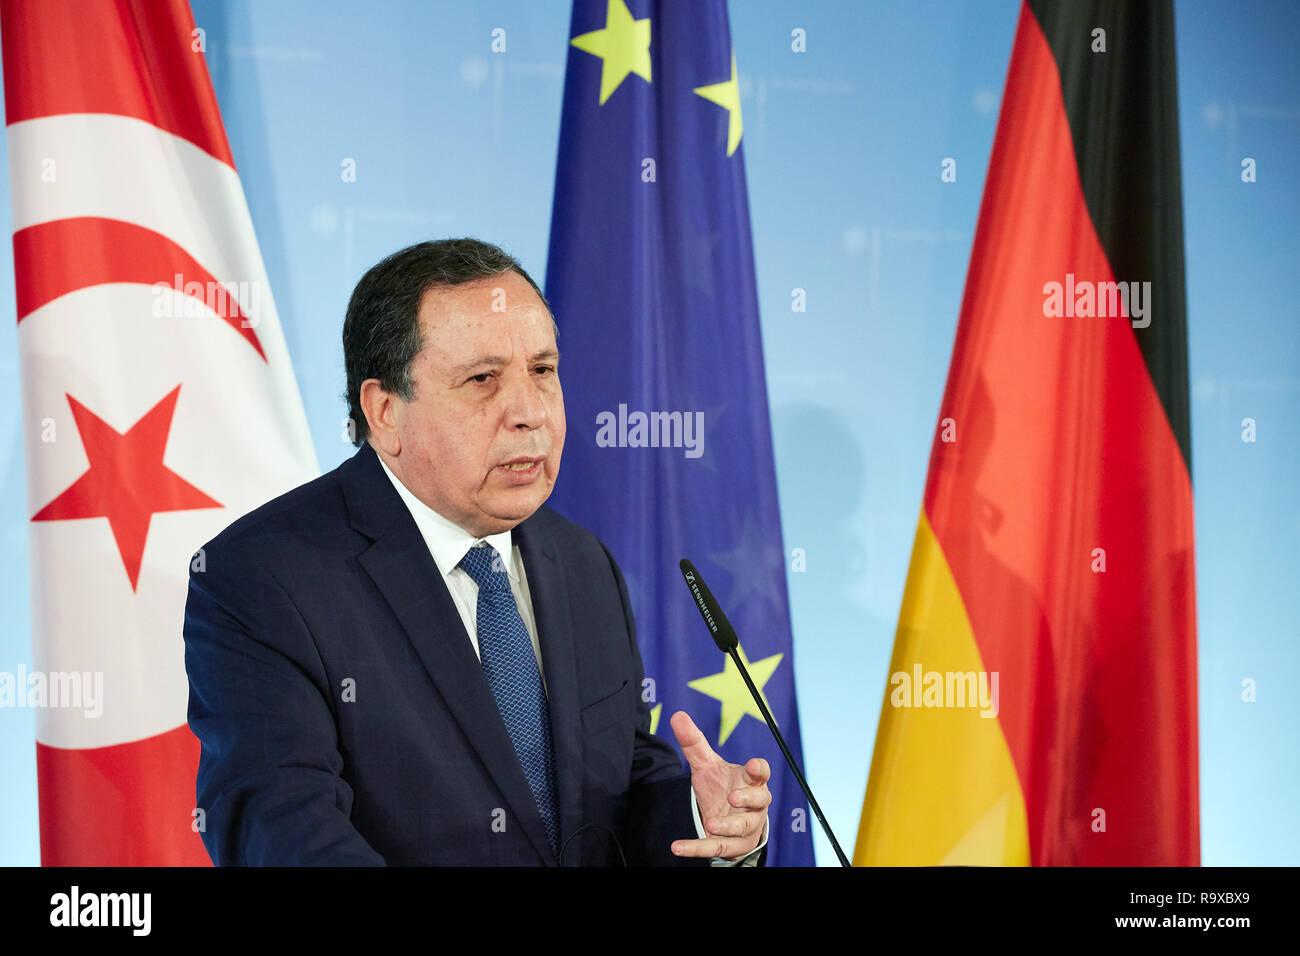 17.10.2018, Berlin, Deutschland - Der tunesische Aussenminister Khemaies Jhinaoui. 00R181017D039 [MODEL RELEASE: NO, PROPERTY RELEASE: NO (c) caro ima - Stock Image